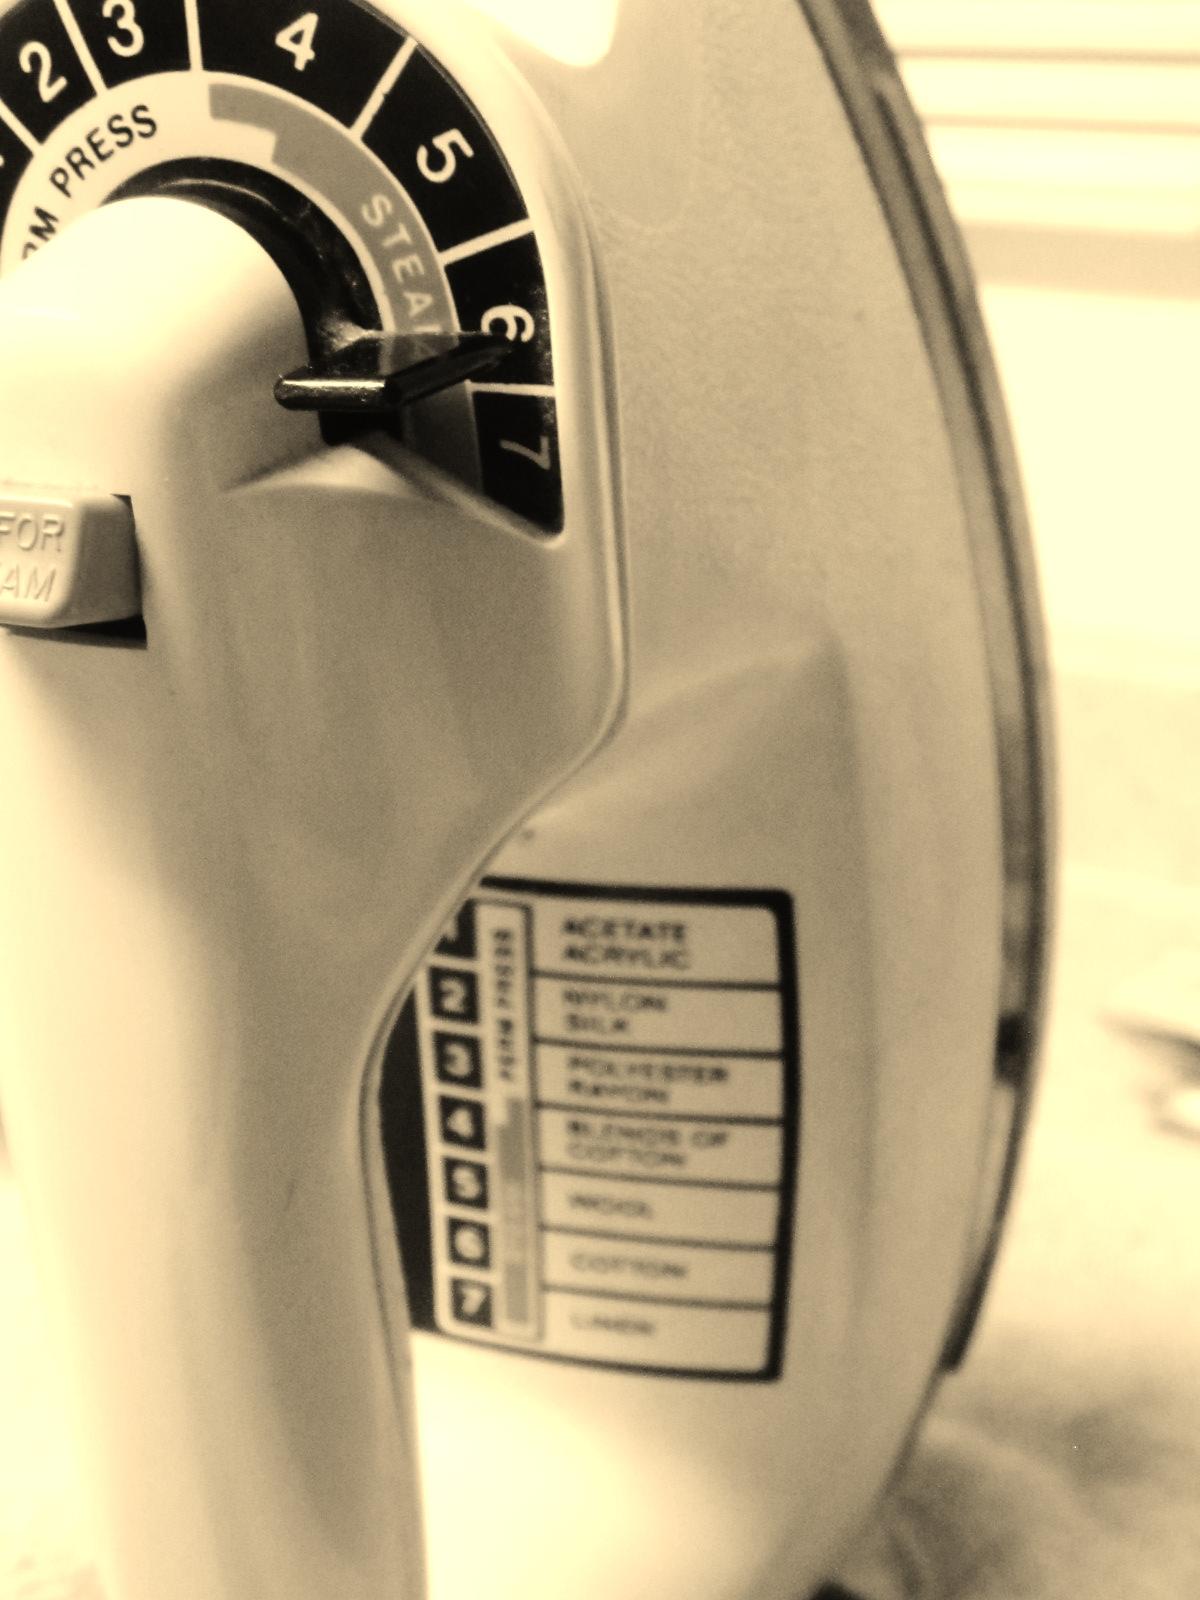 Chef Tess Bakeresse: How To Make Homemade Mylar-Packed 52 Method